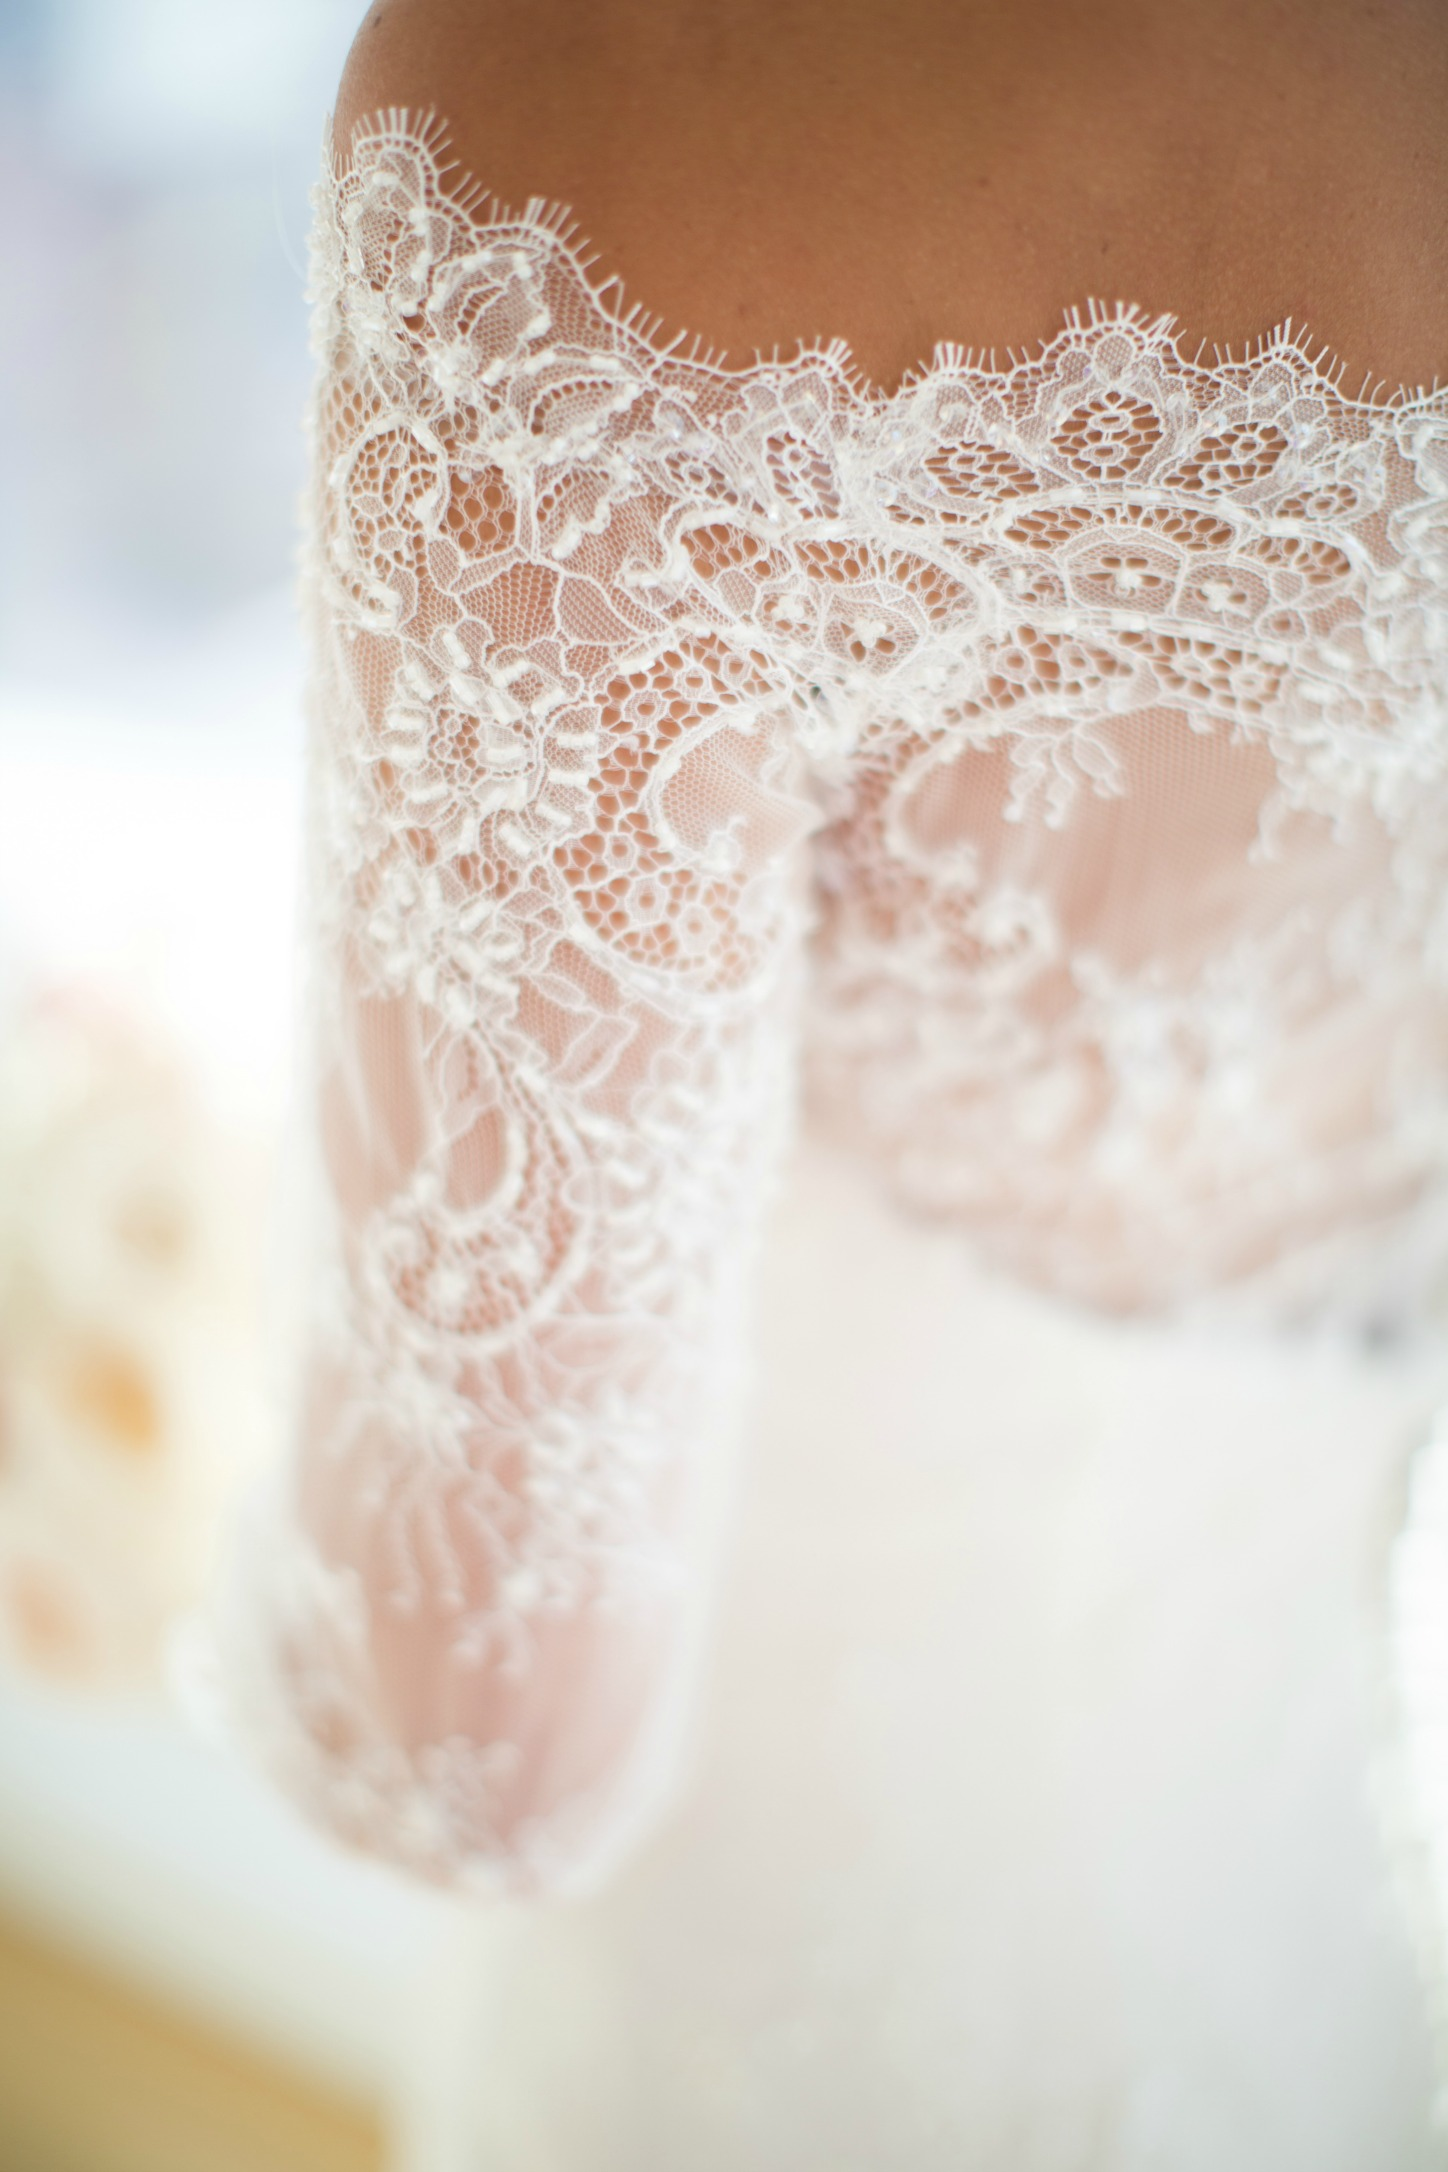 NYC Chic Winter Wedding ǀ Dee Kay Events ǀ Wedding Consultant ǀ Wedding Design ǀ Custom Bride Dress